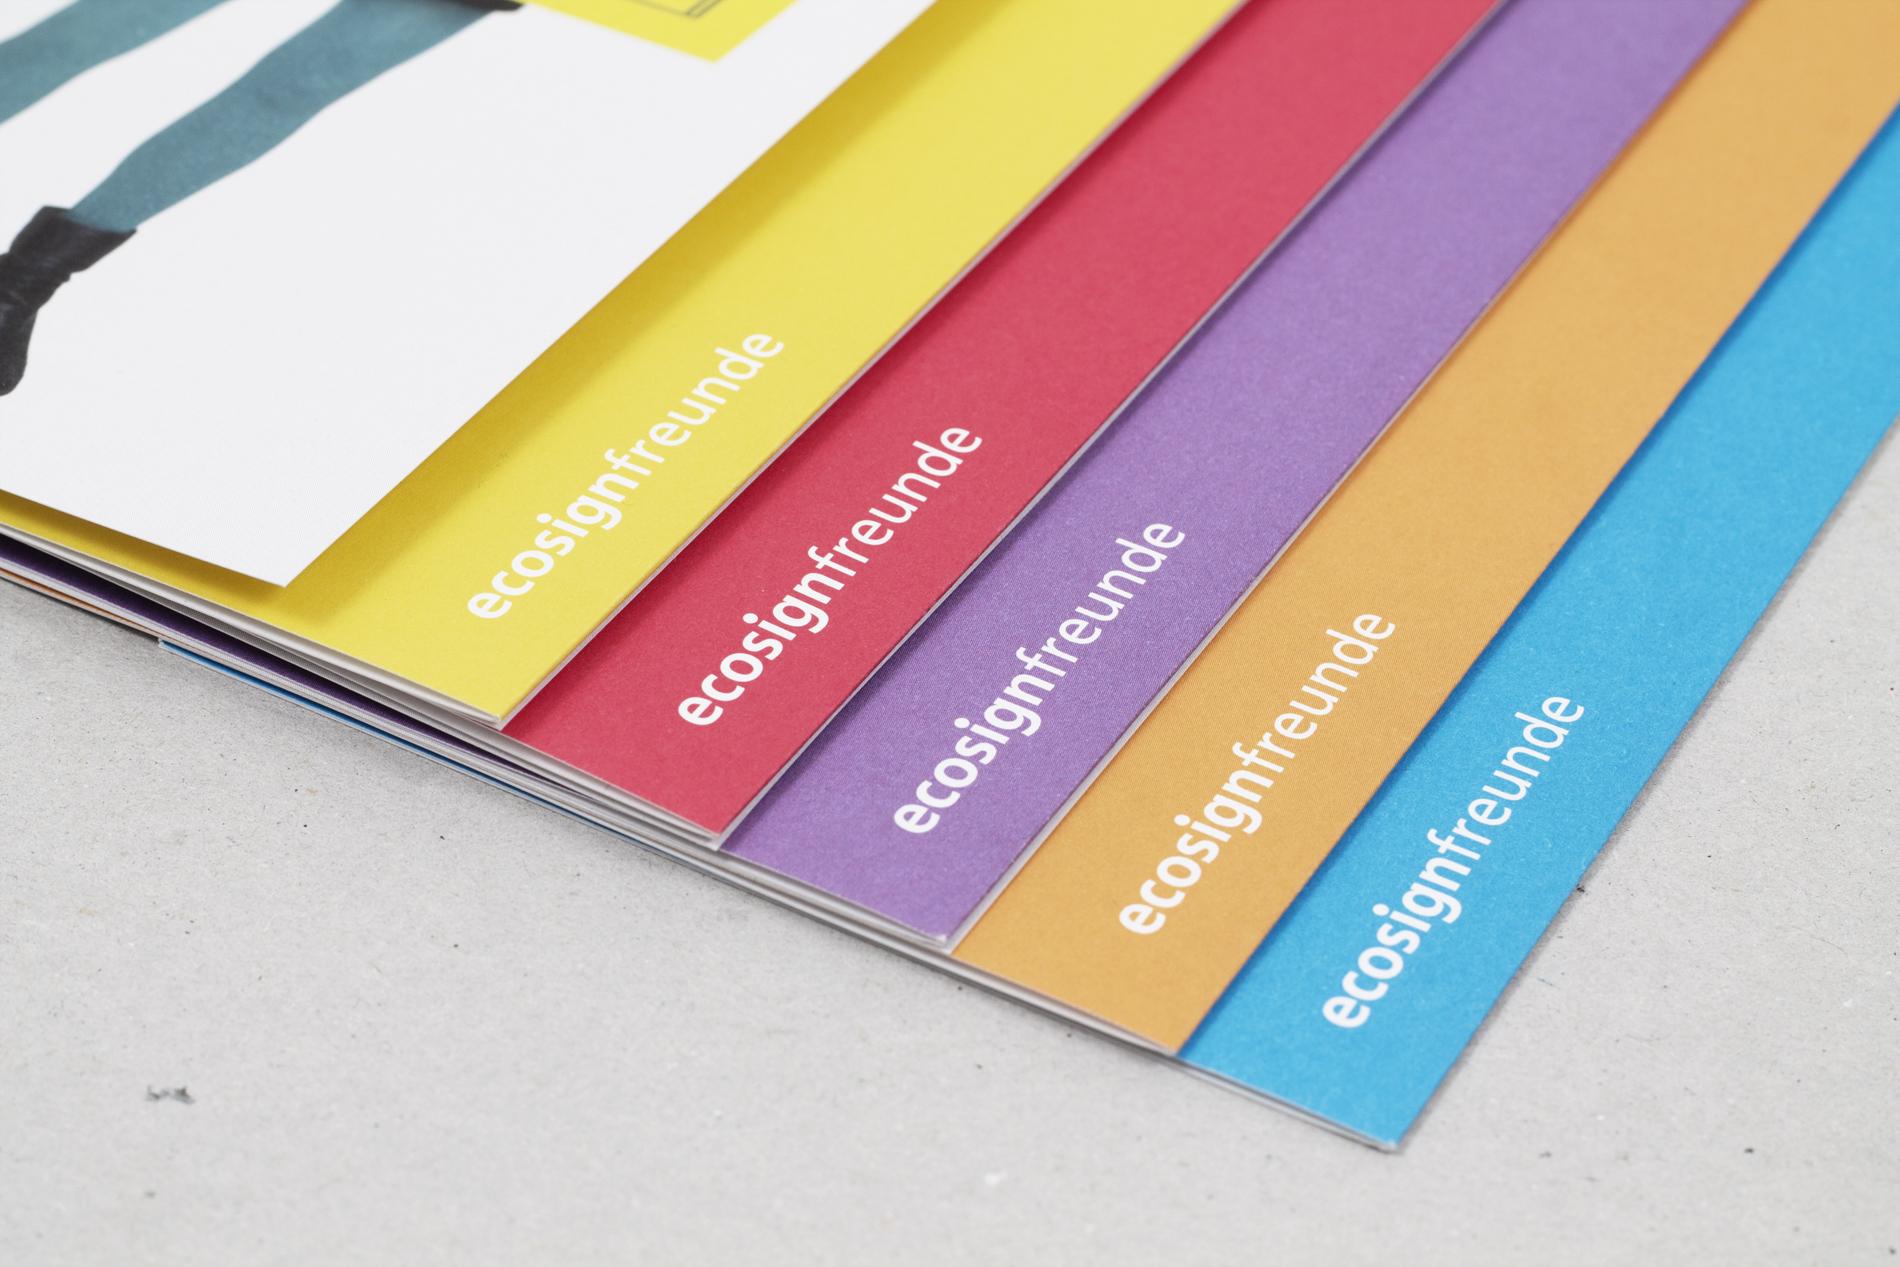 ecosignfreunde – Flyer